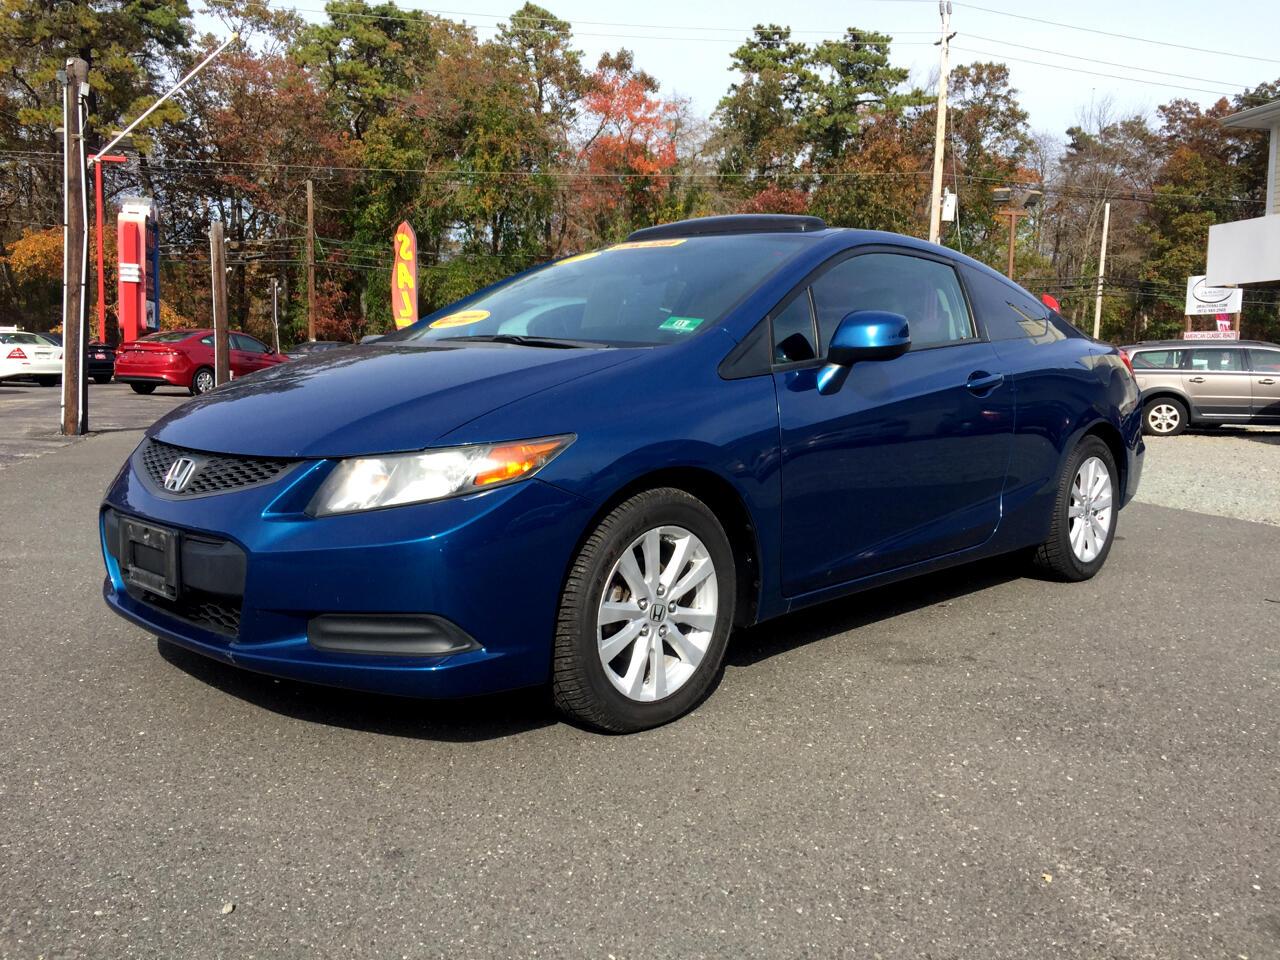 2012 Honda Civic EX-L Coupe 5-Spd AT